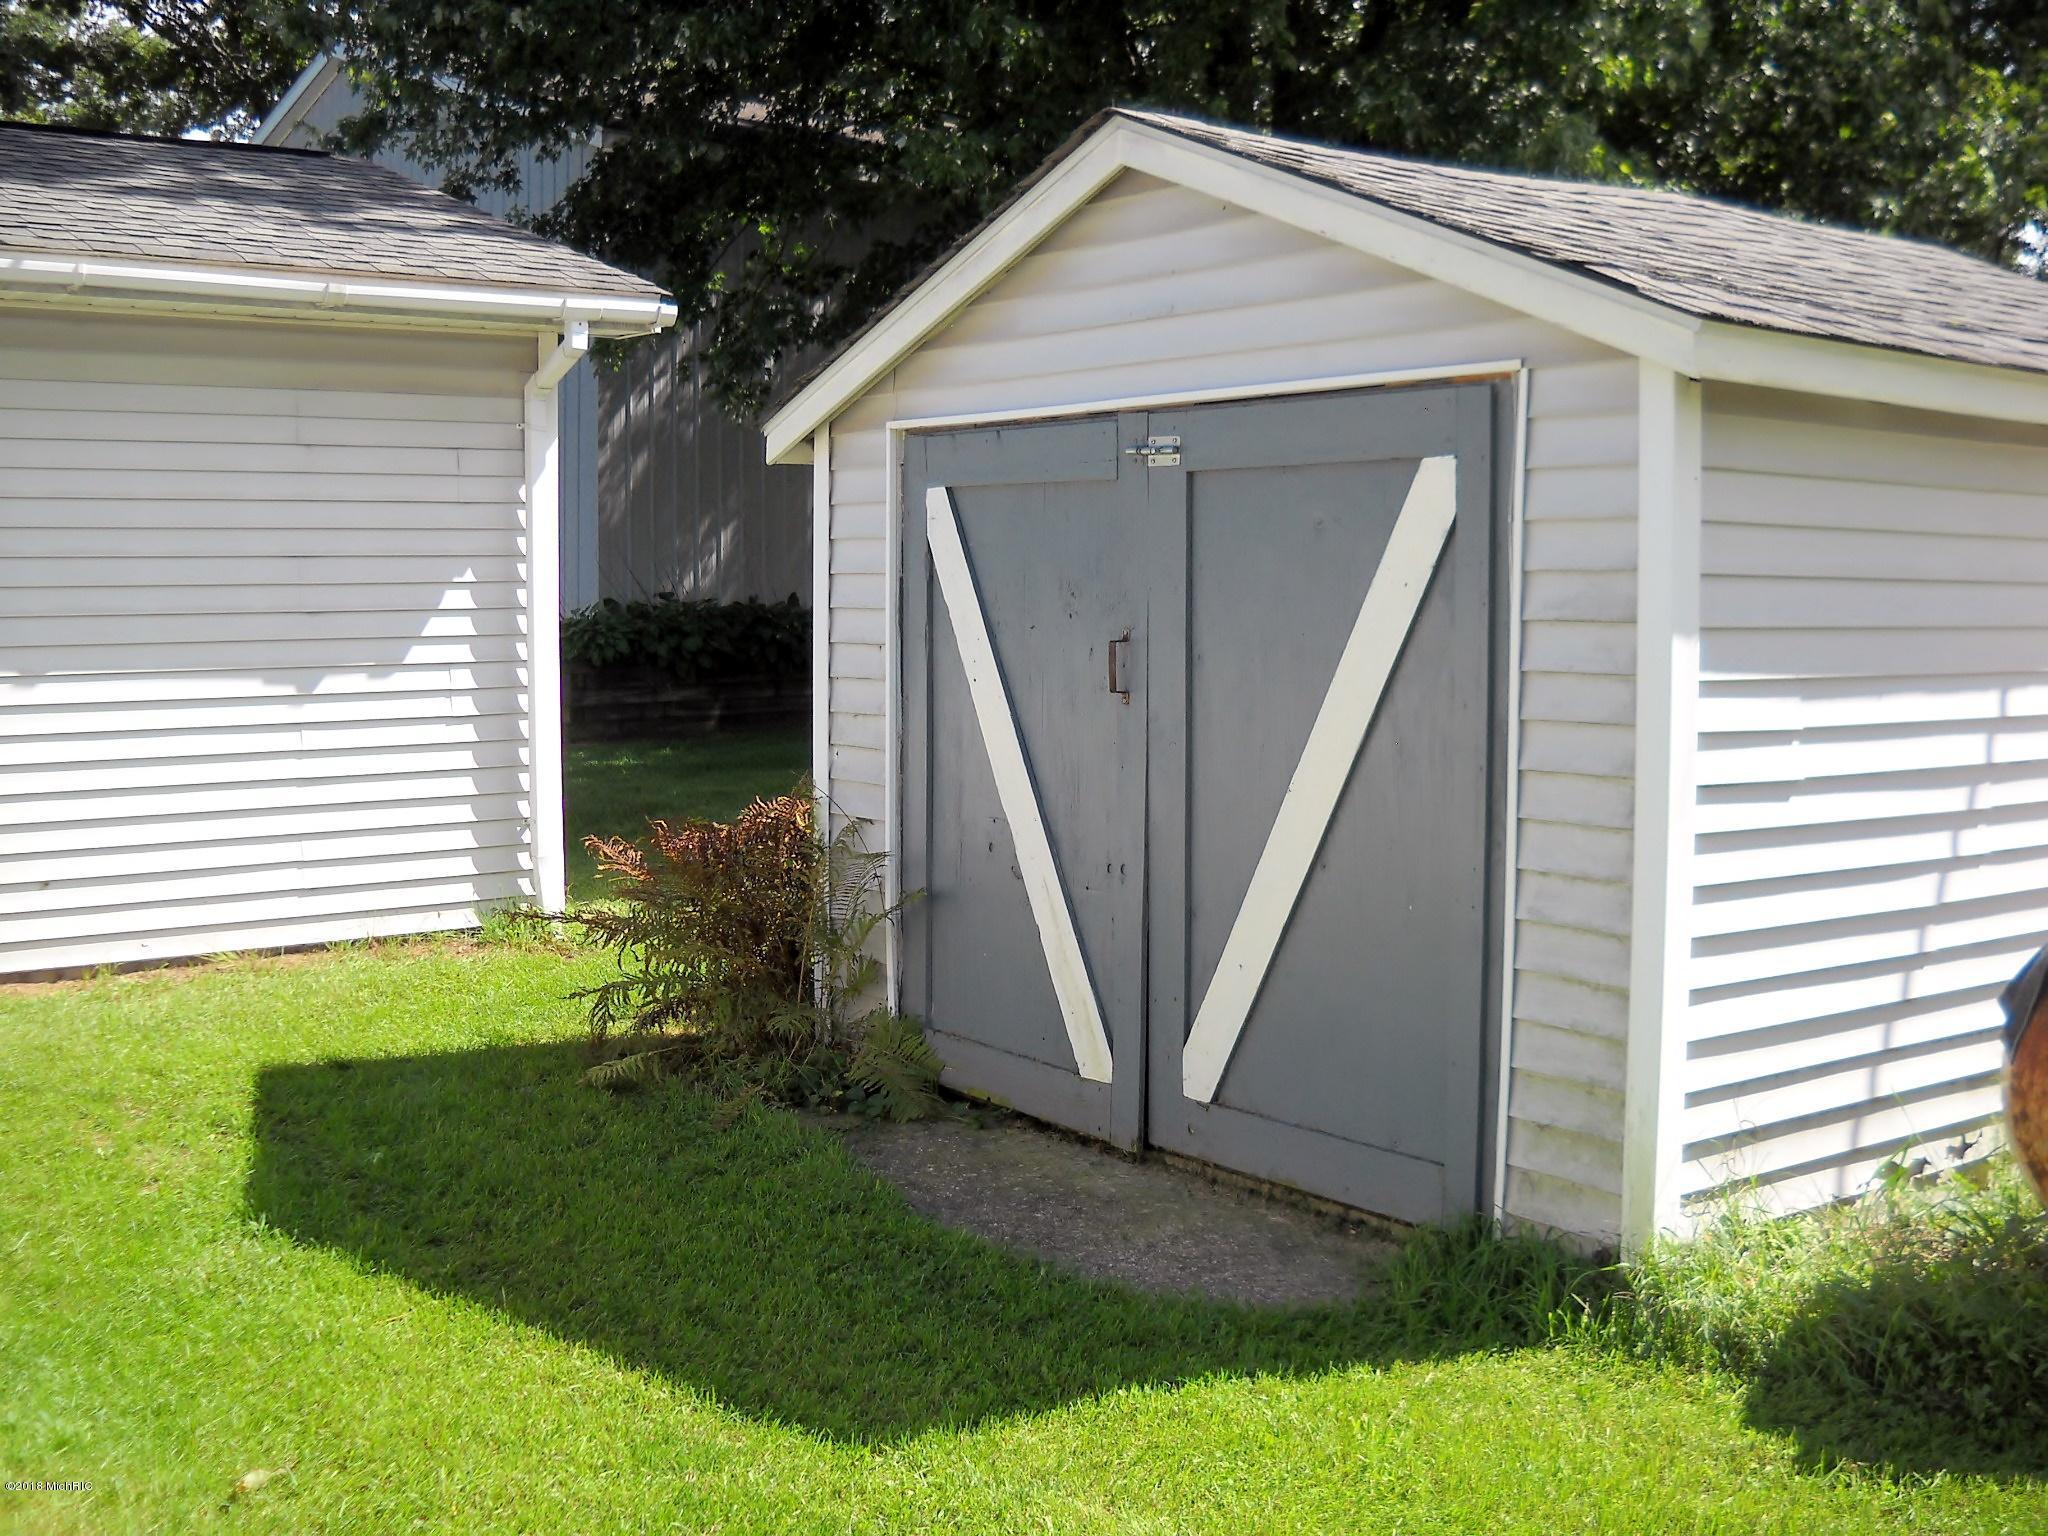 Storage shed #2